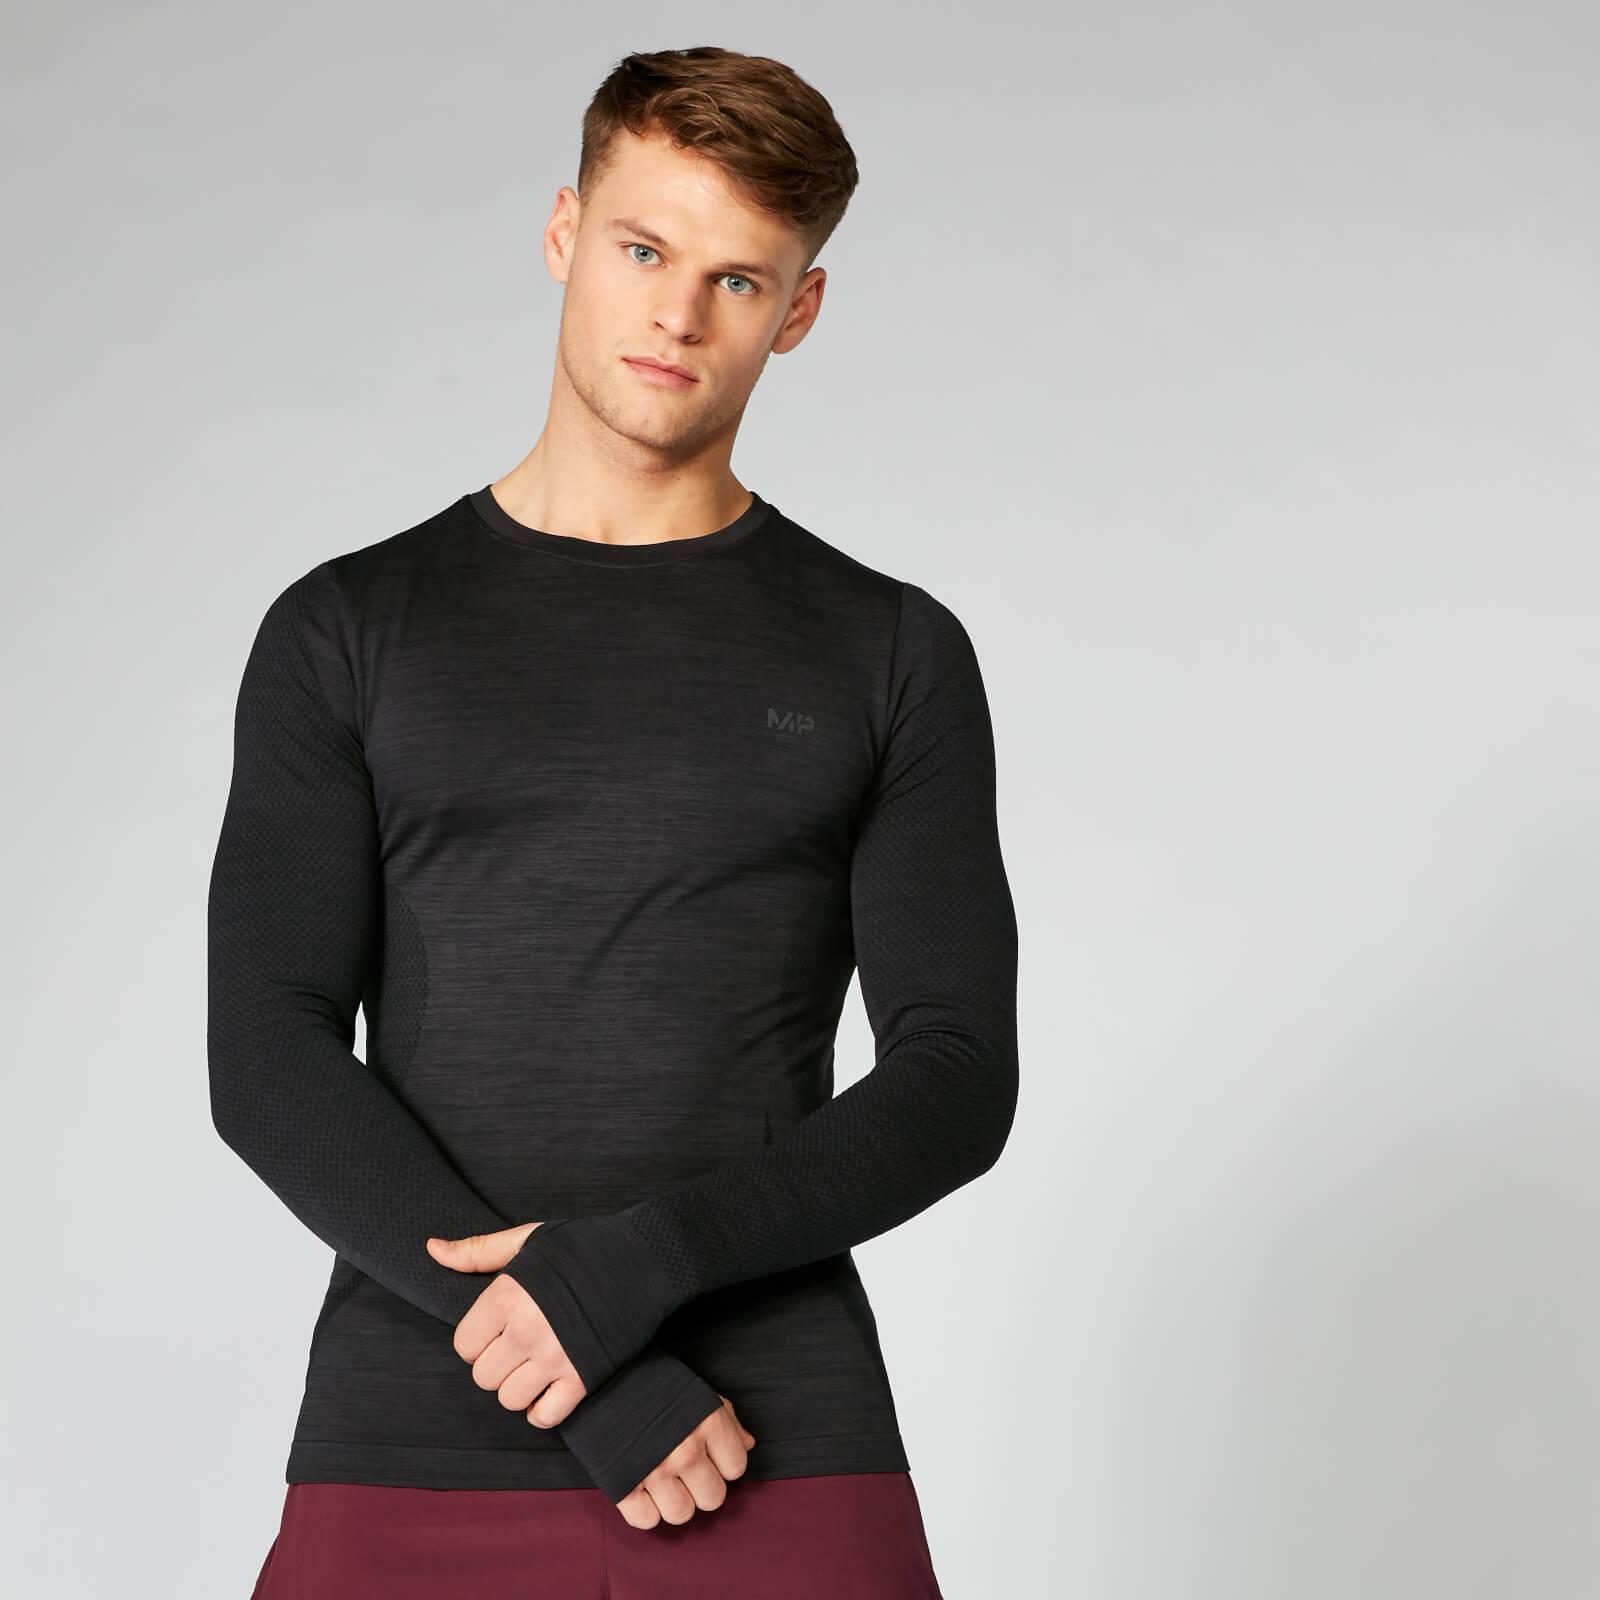 Myprotein Seamless Long Sleeve T-Shirt - Black - M